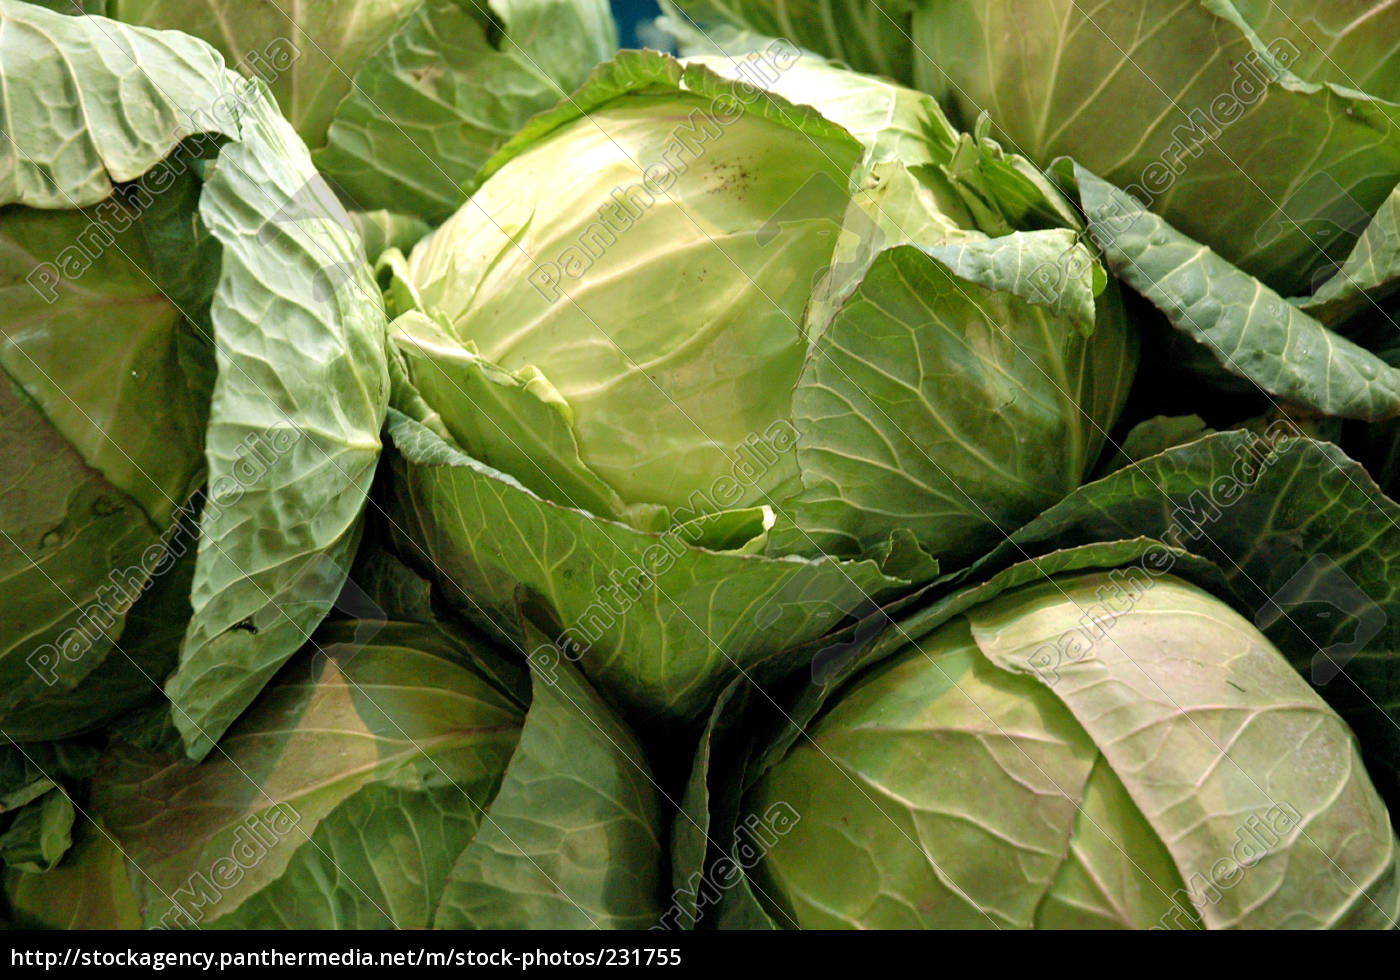 cabbage - 231755